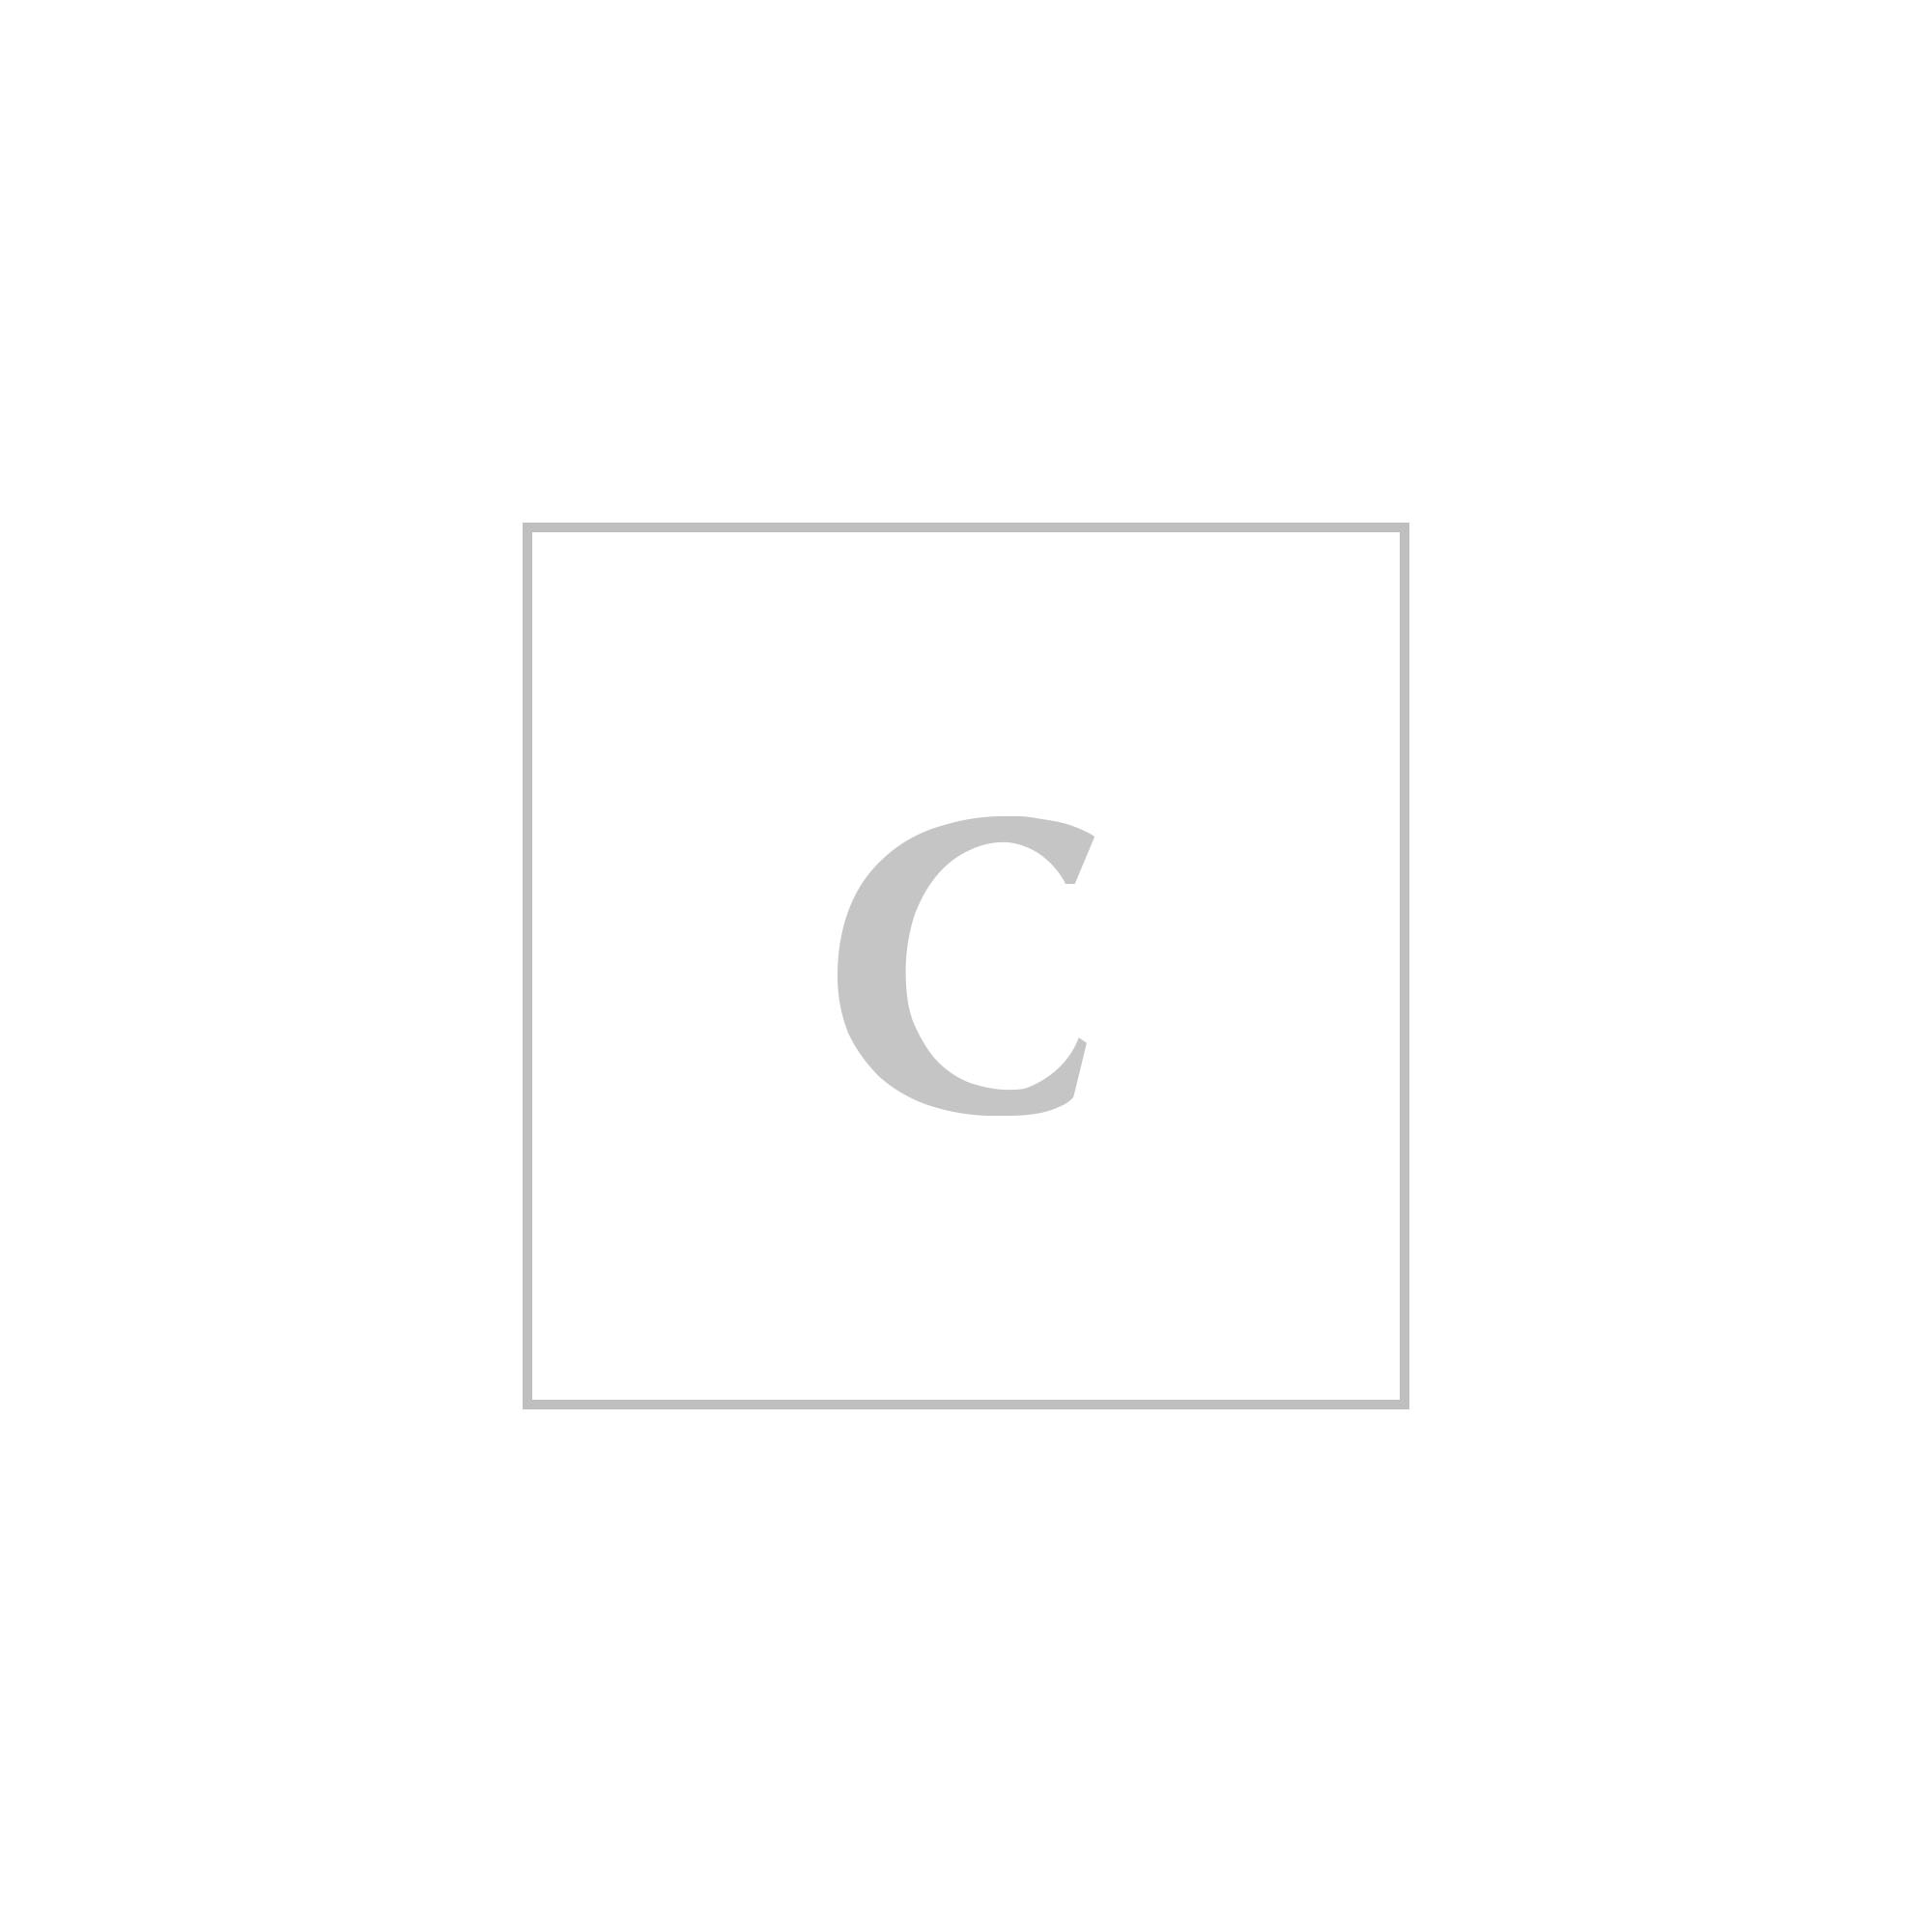 Moncler capsule giubbotto donville